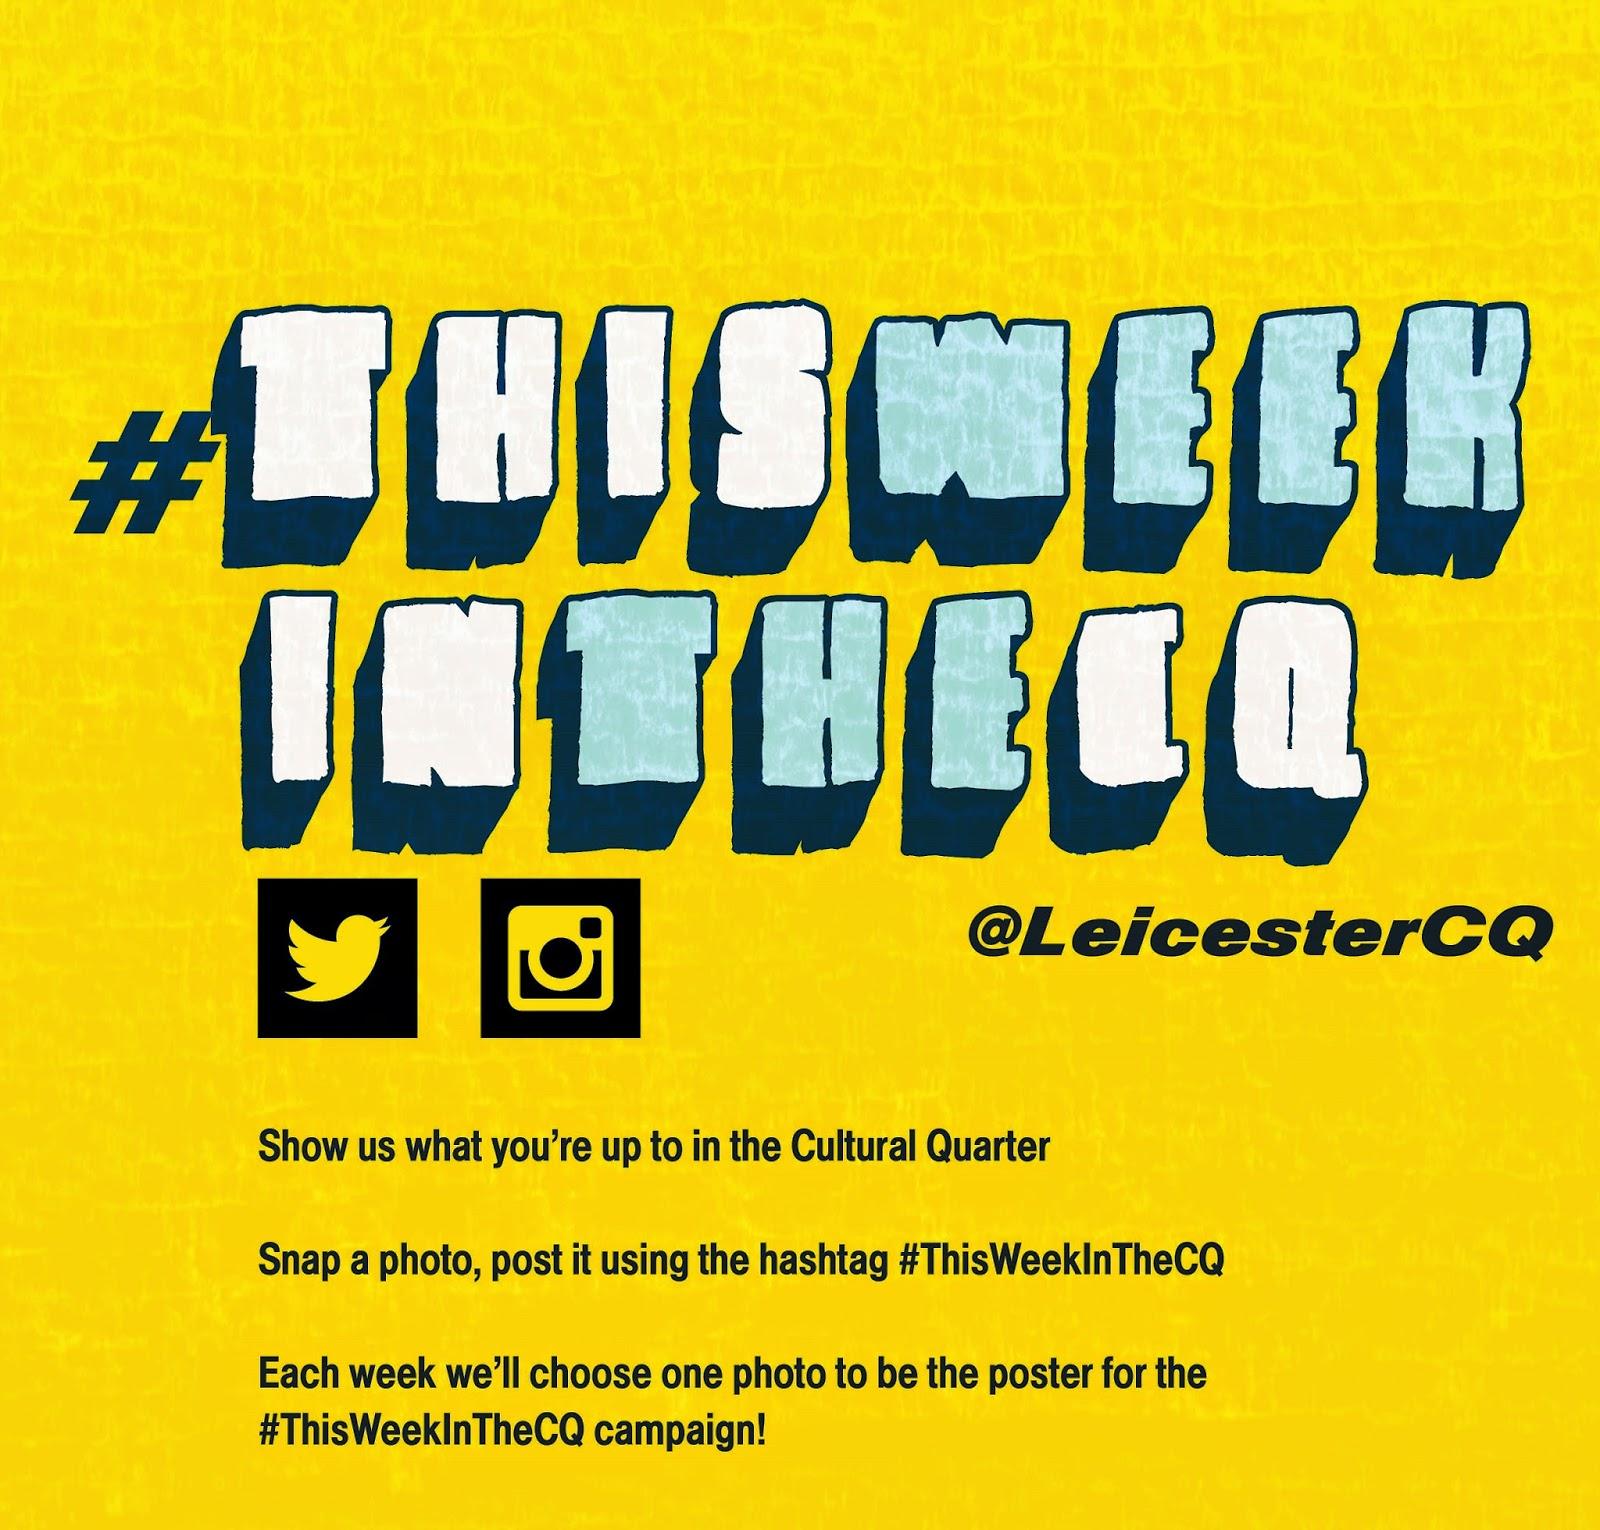 cultural quarter, leicester, social media